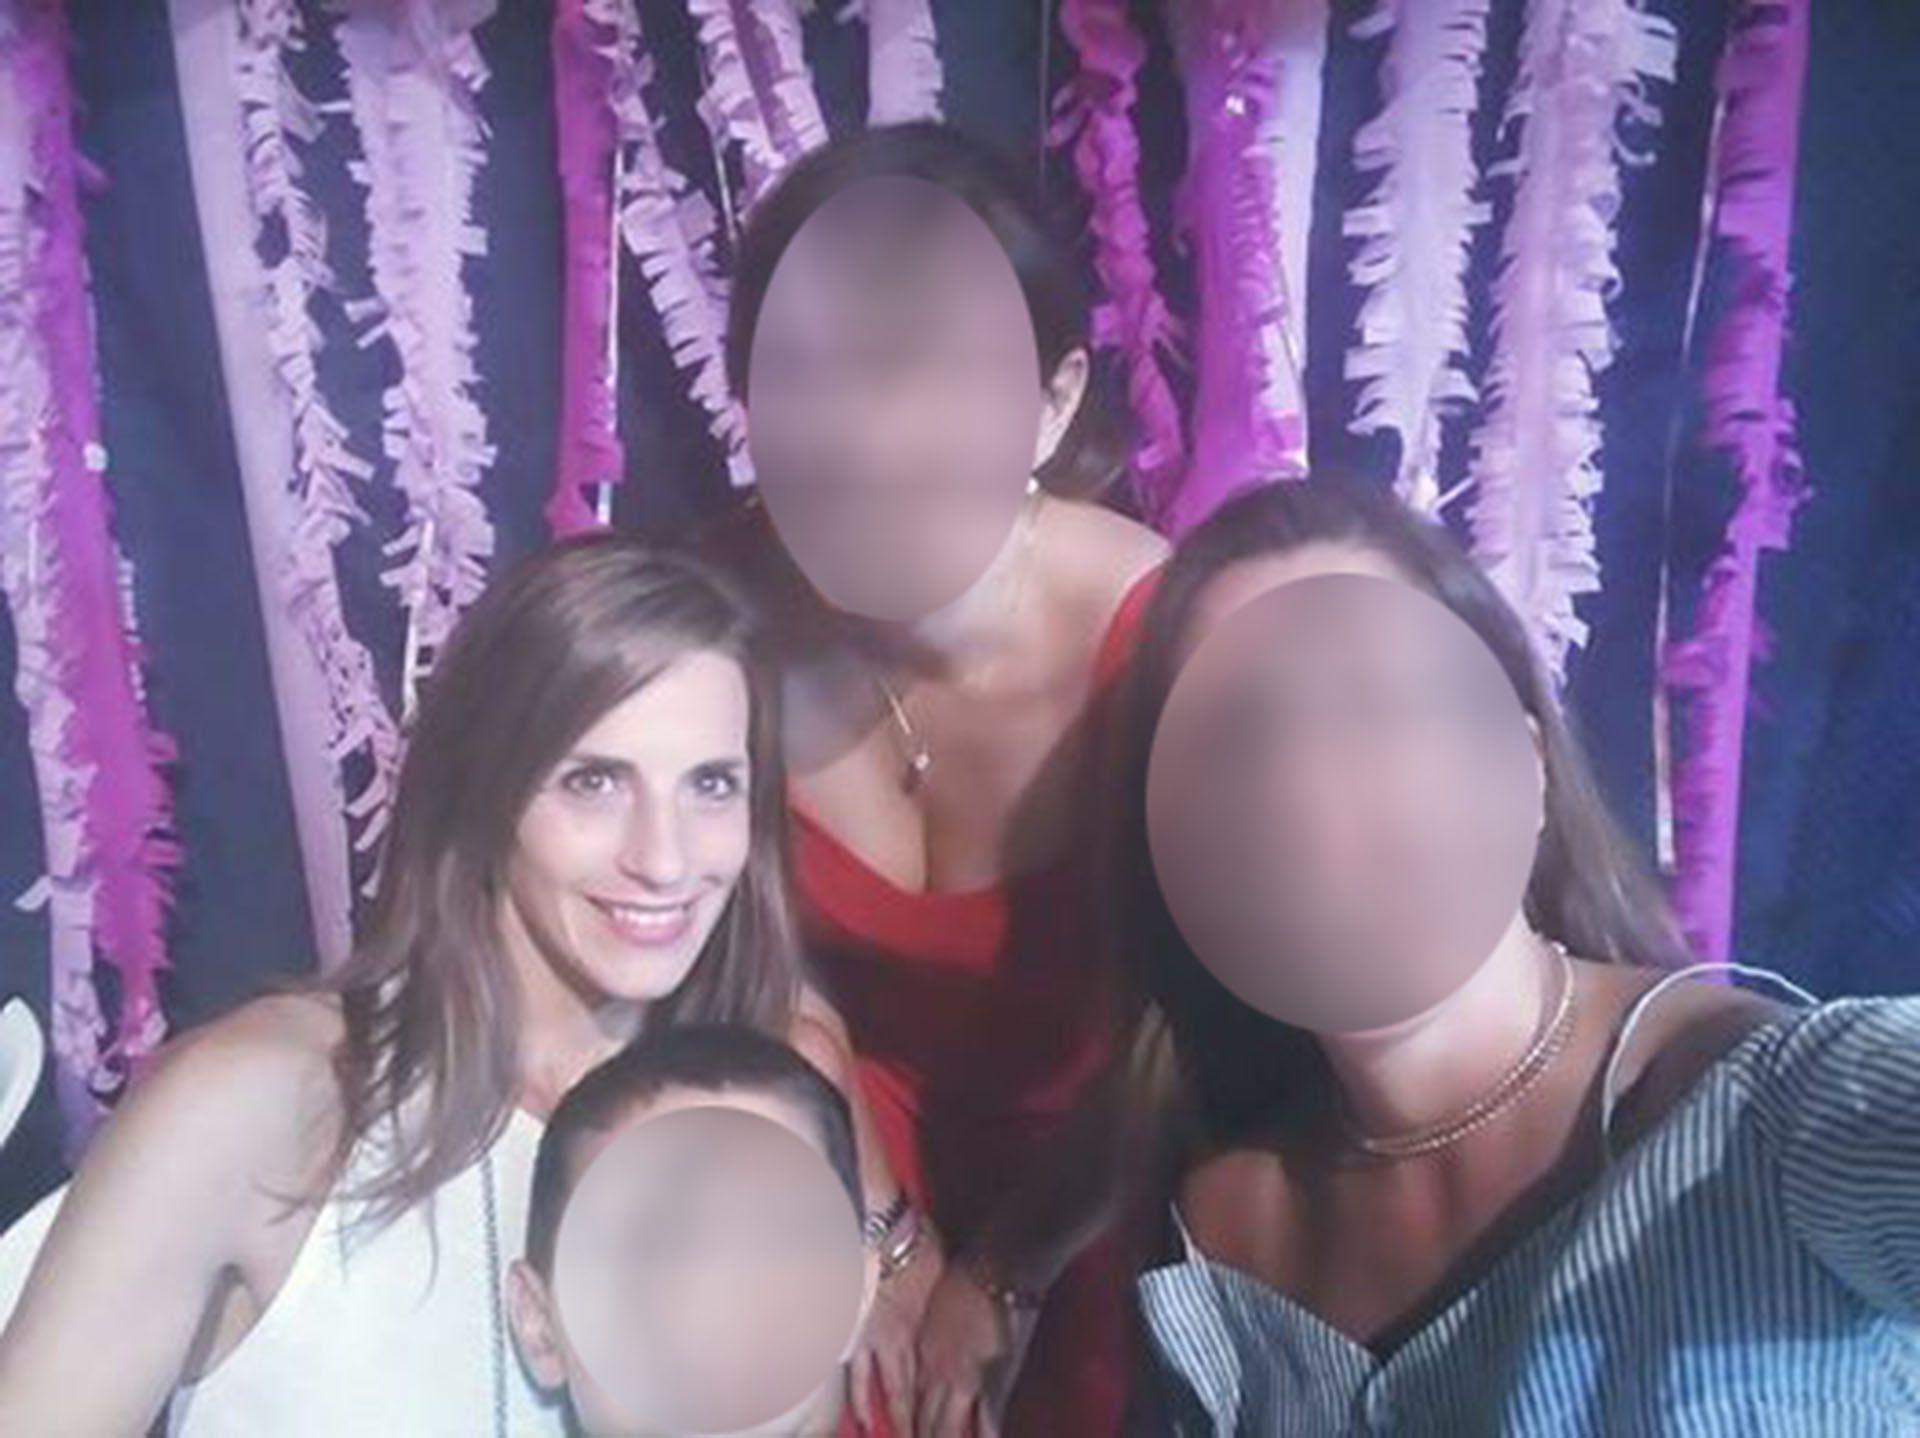 Ordenan liberar a la vocera trucha de Juliana Awada: deberá pagar 500 mil pesos